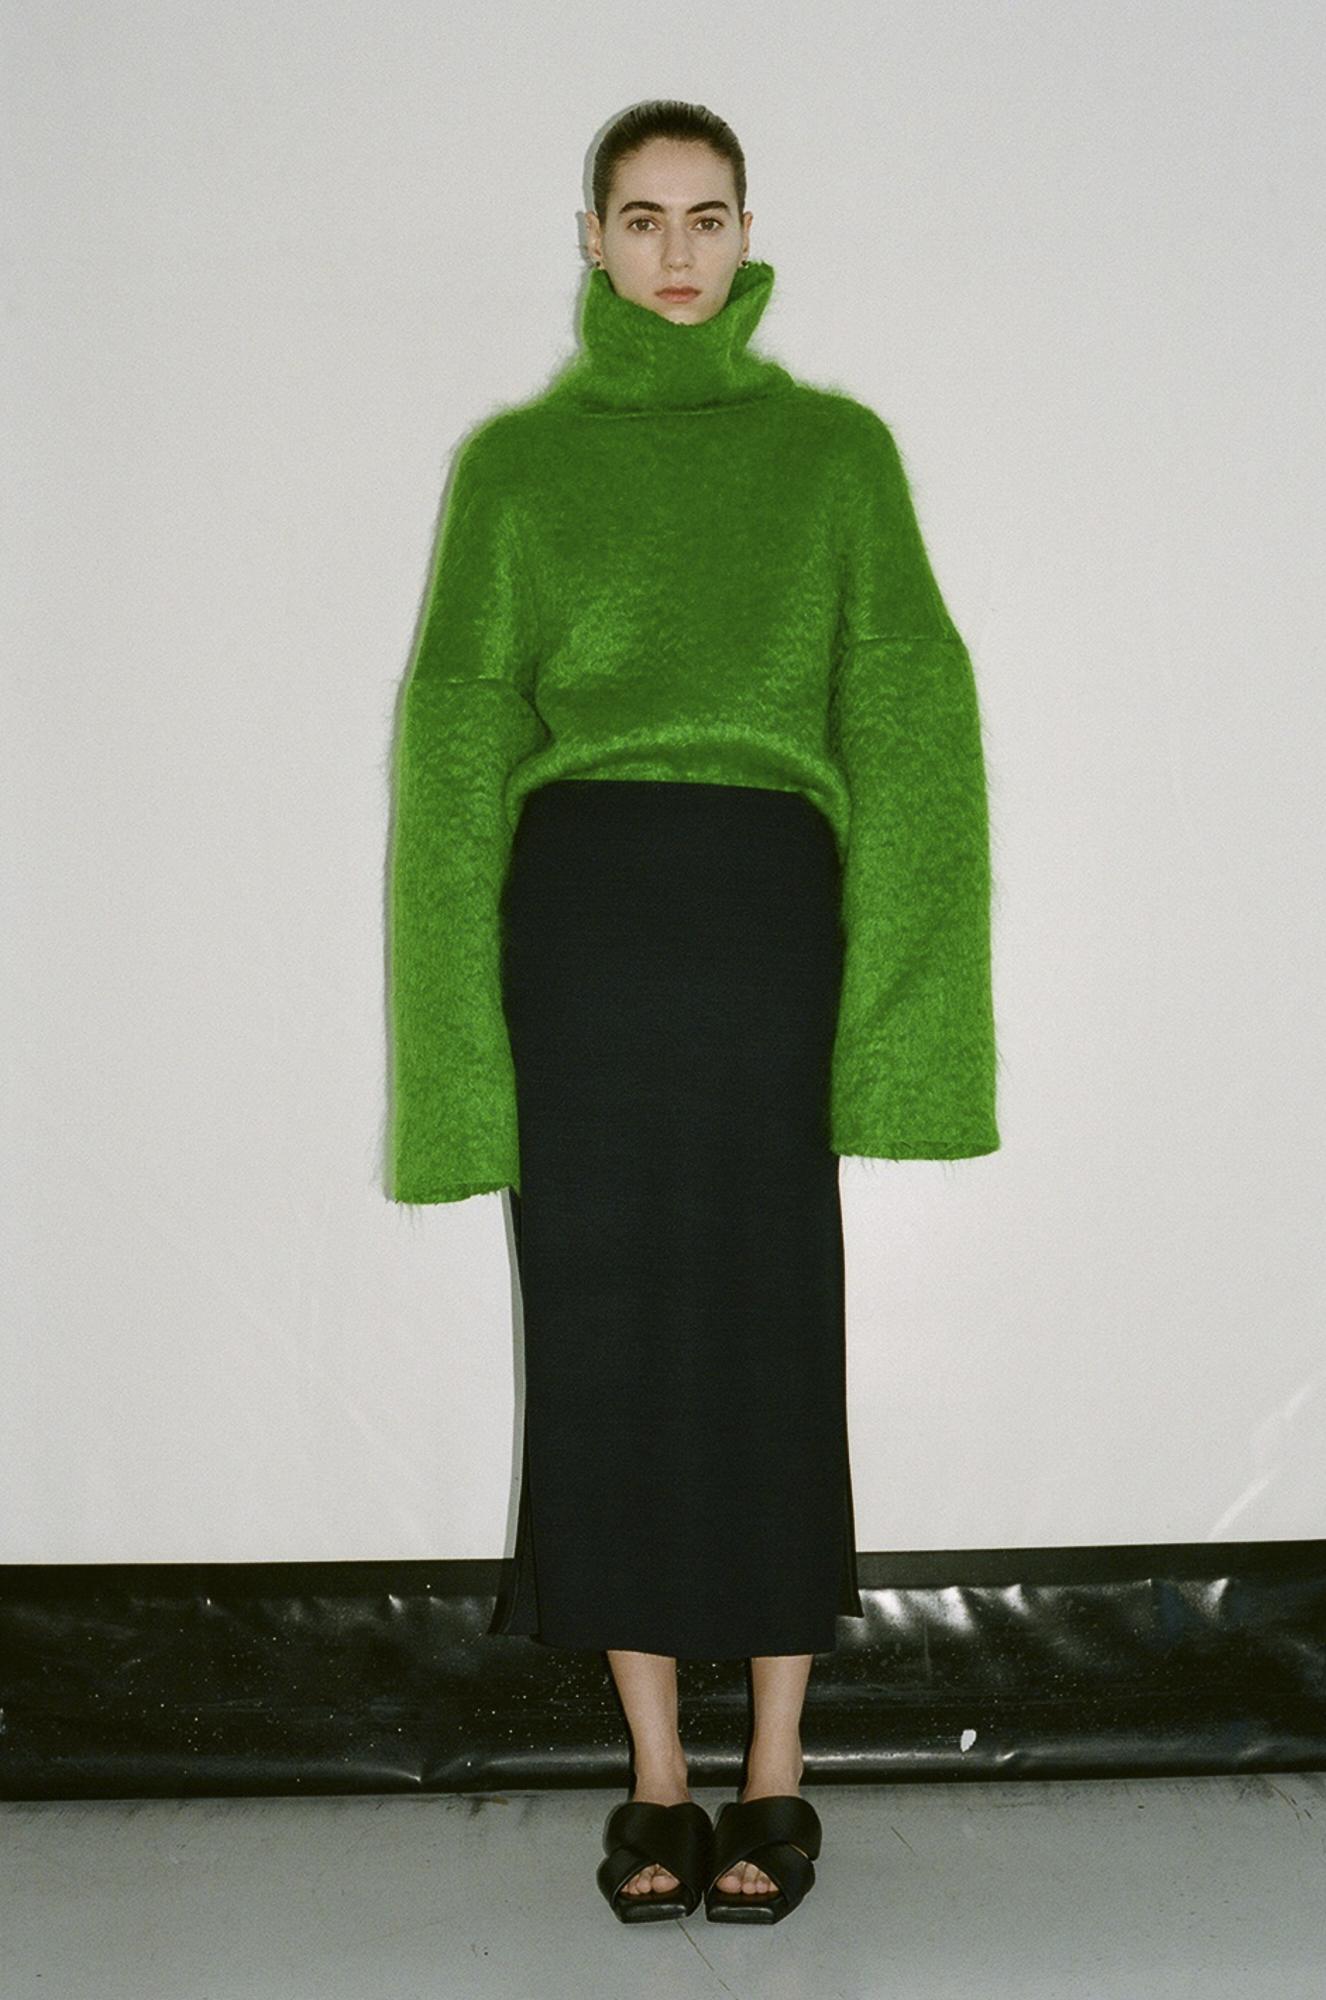 GAUCHERE Fall Winter 2021 Paris Fashion Week LOOK 6 Top TIDUS, Skirt THEOLINE, Shoes DOUBLE X